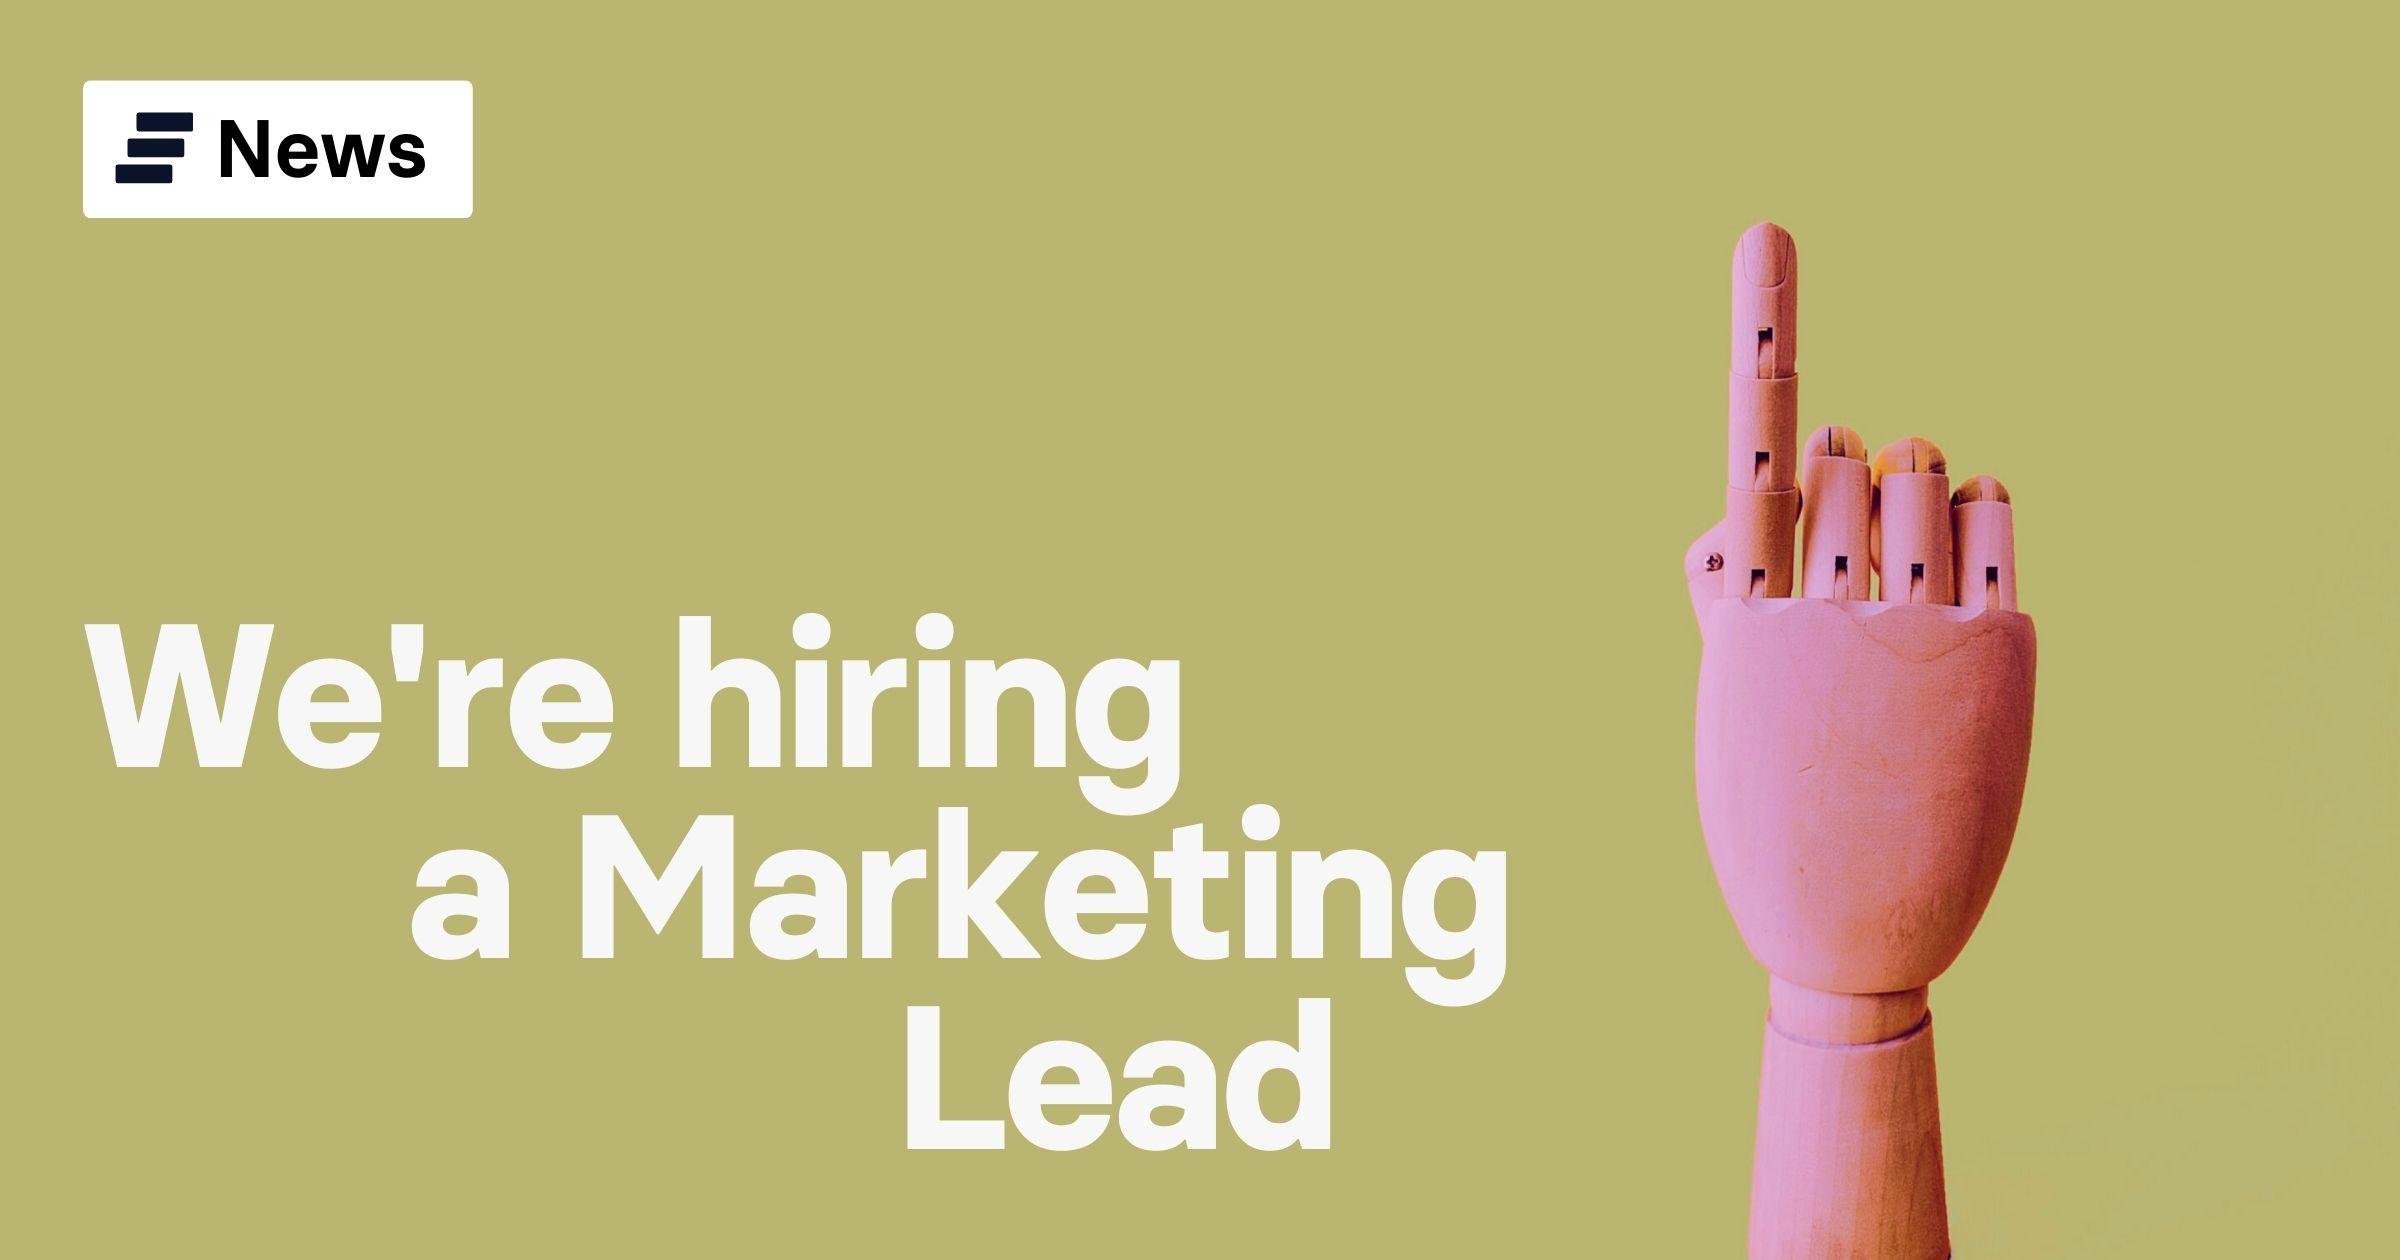 We're hiring: Marketing Lead